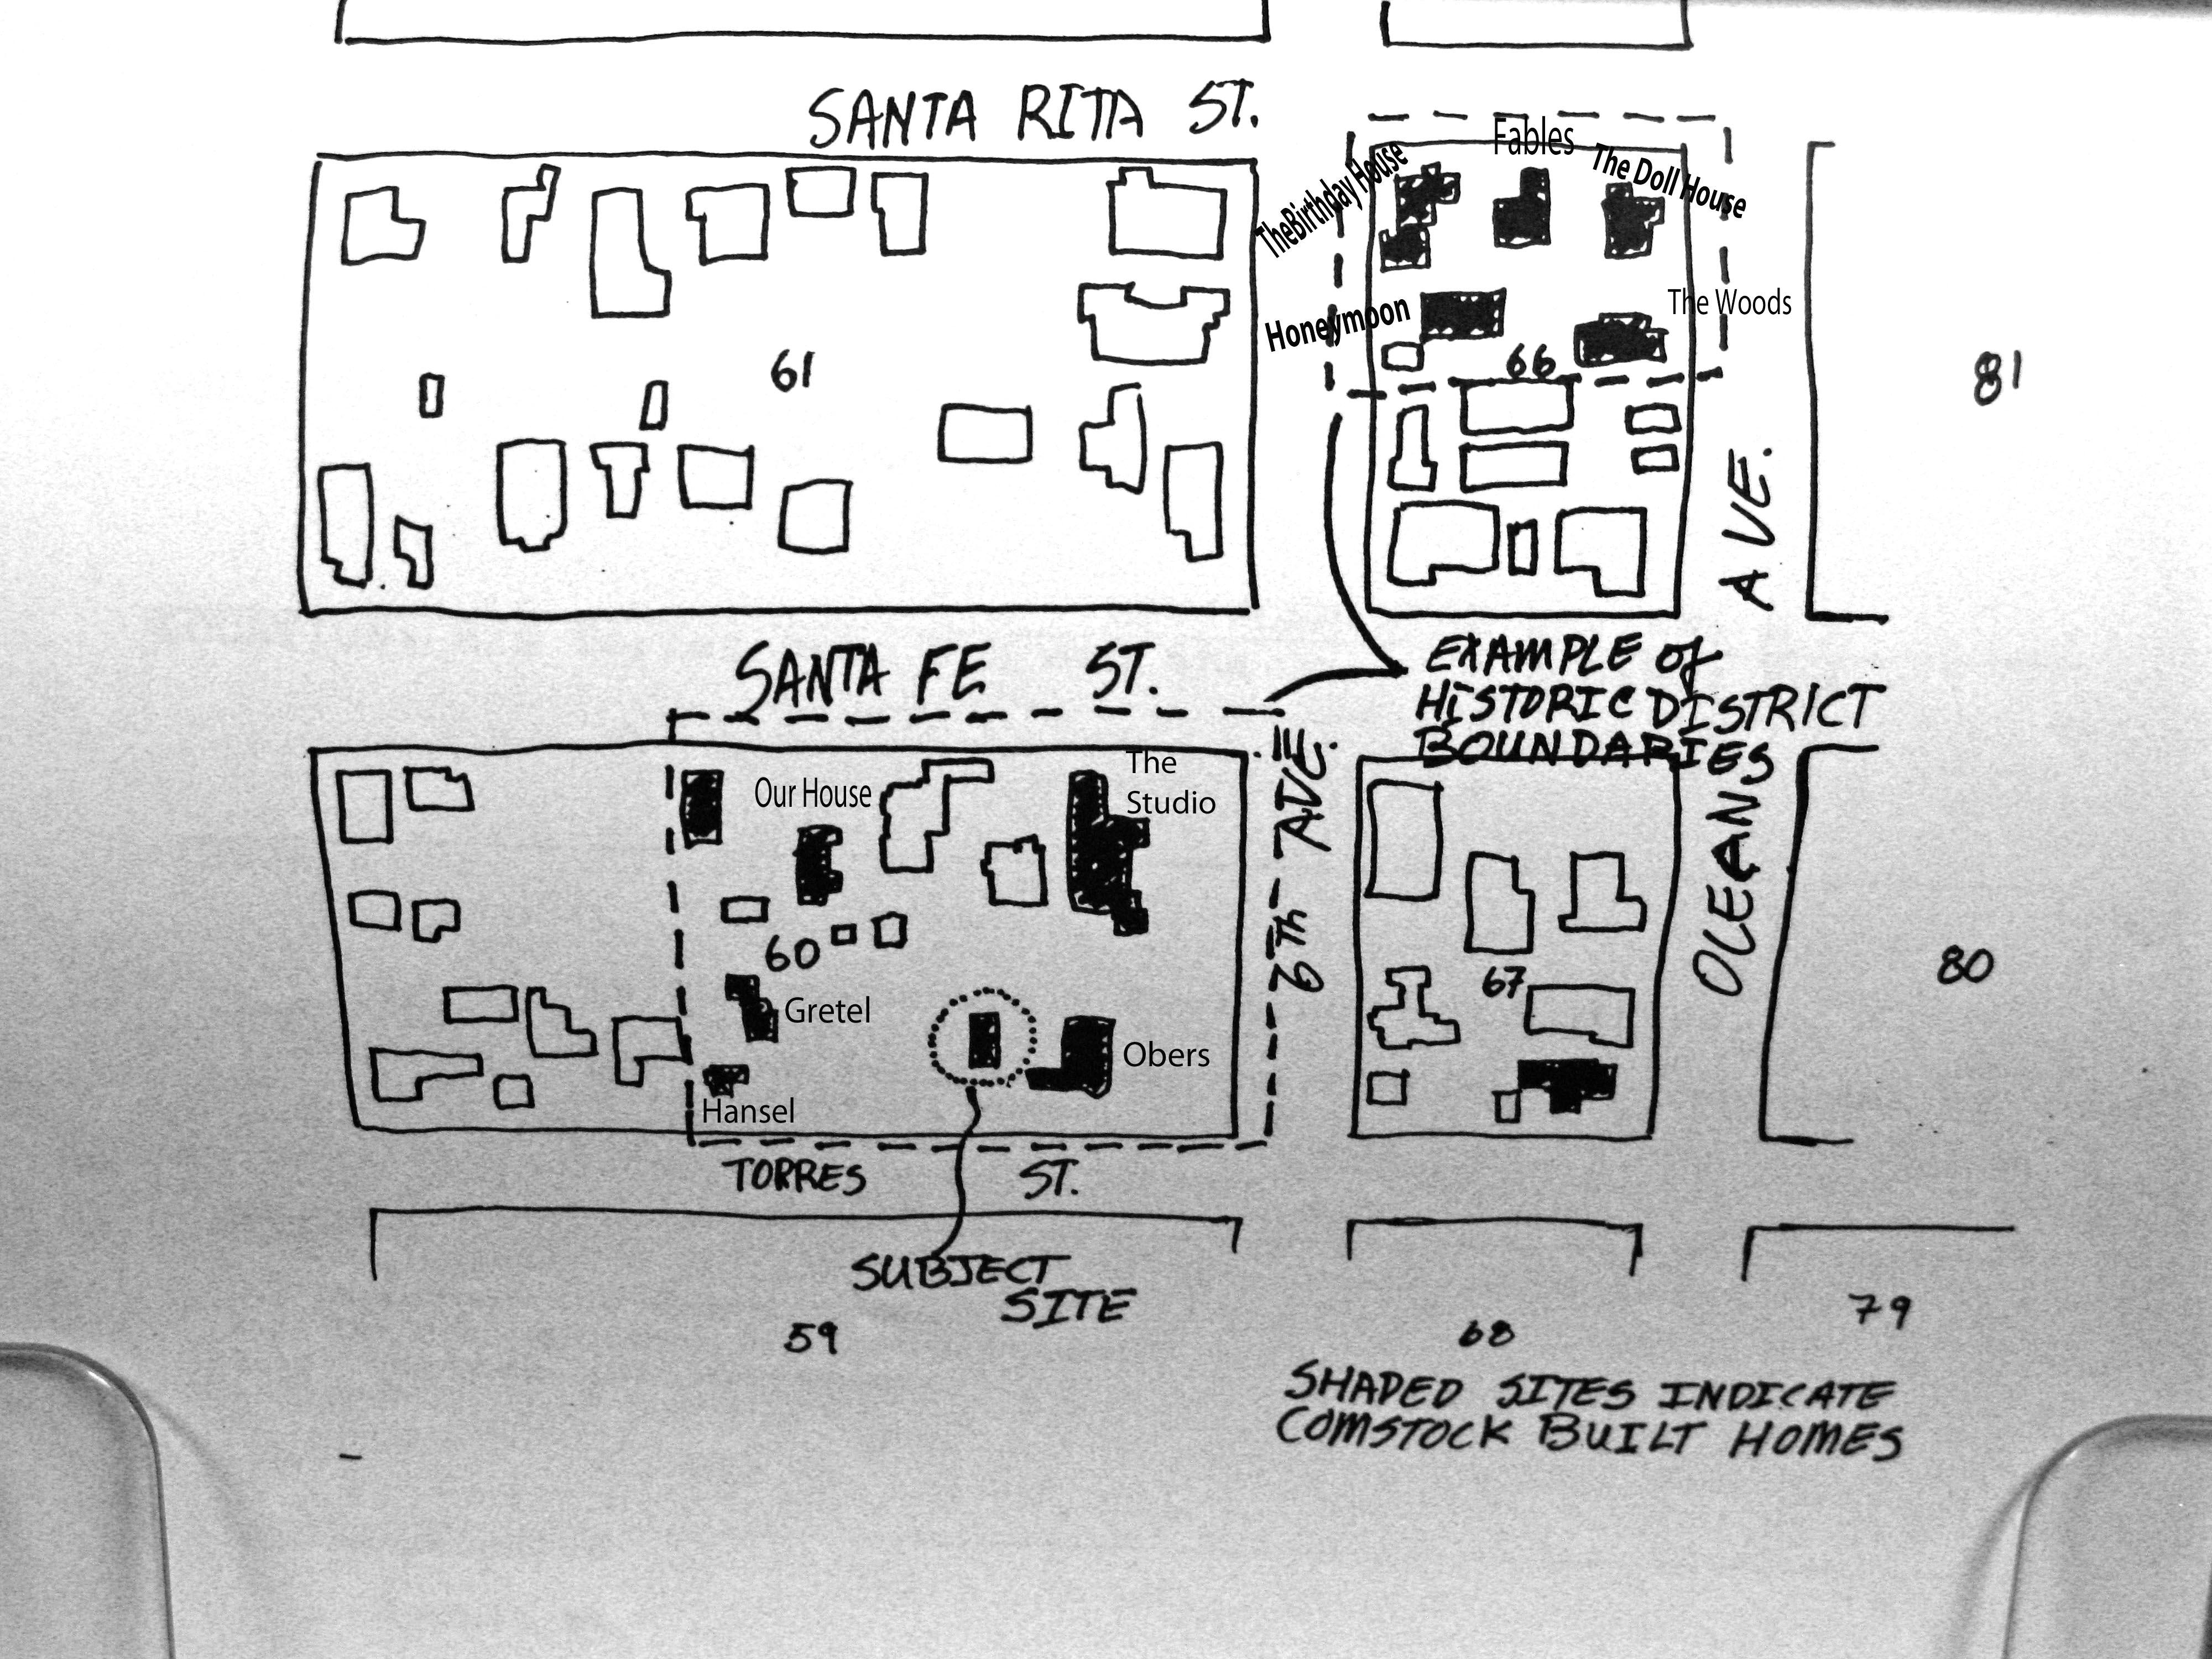 HUGH COMSTOCK FLOOR PLAN FOR THE BIRTHDAY HOUSE – Carmel Cottage House Plans